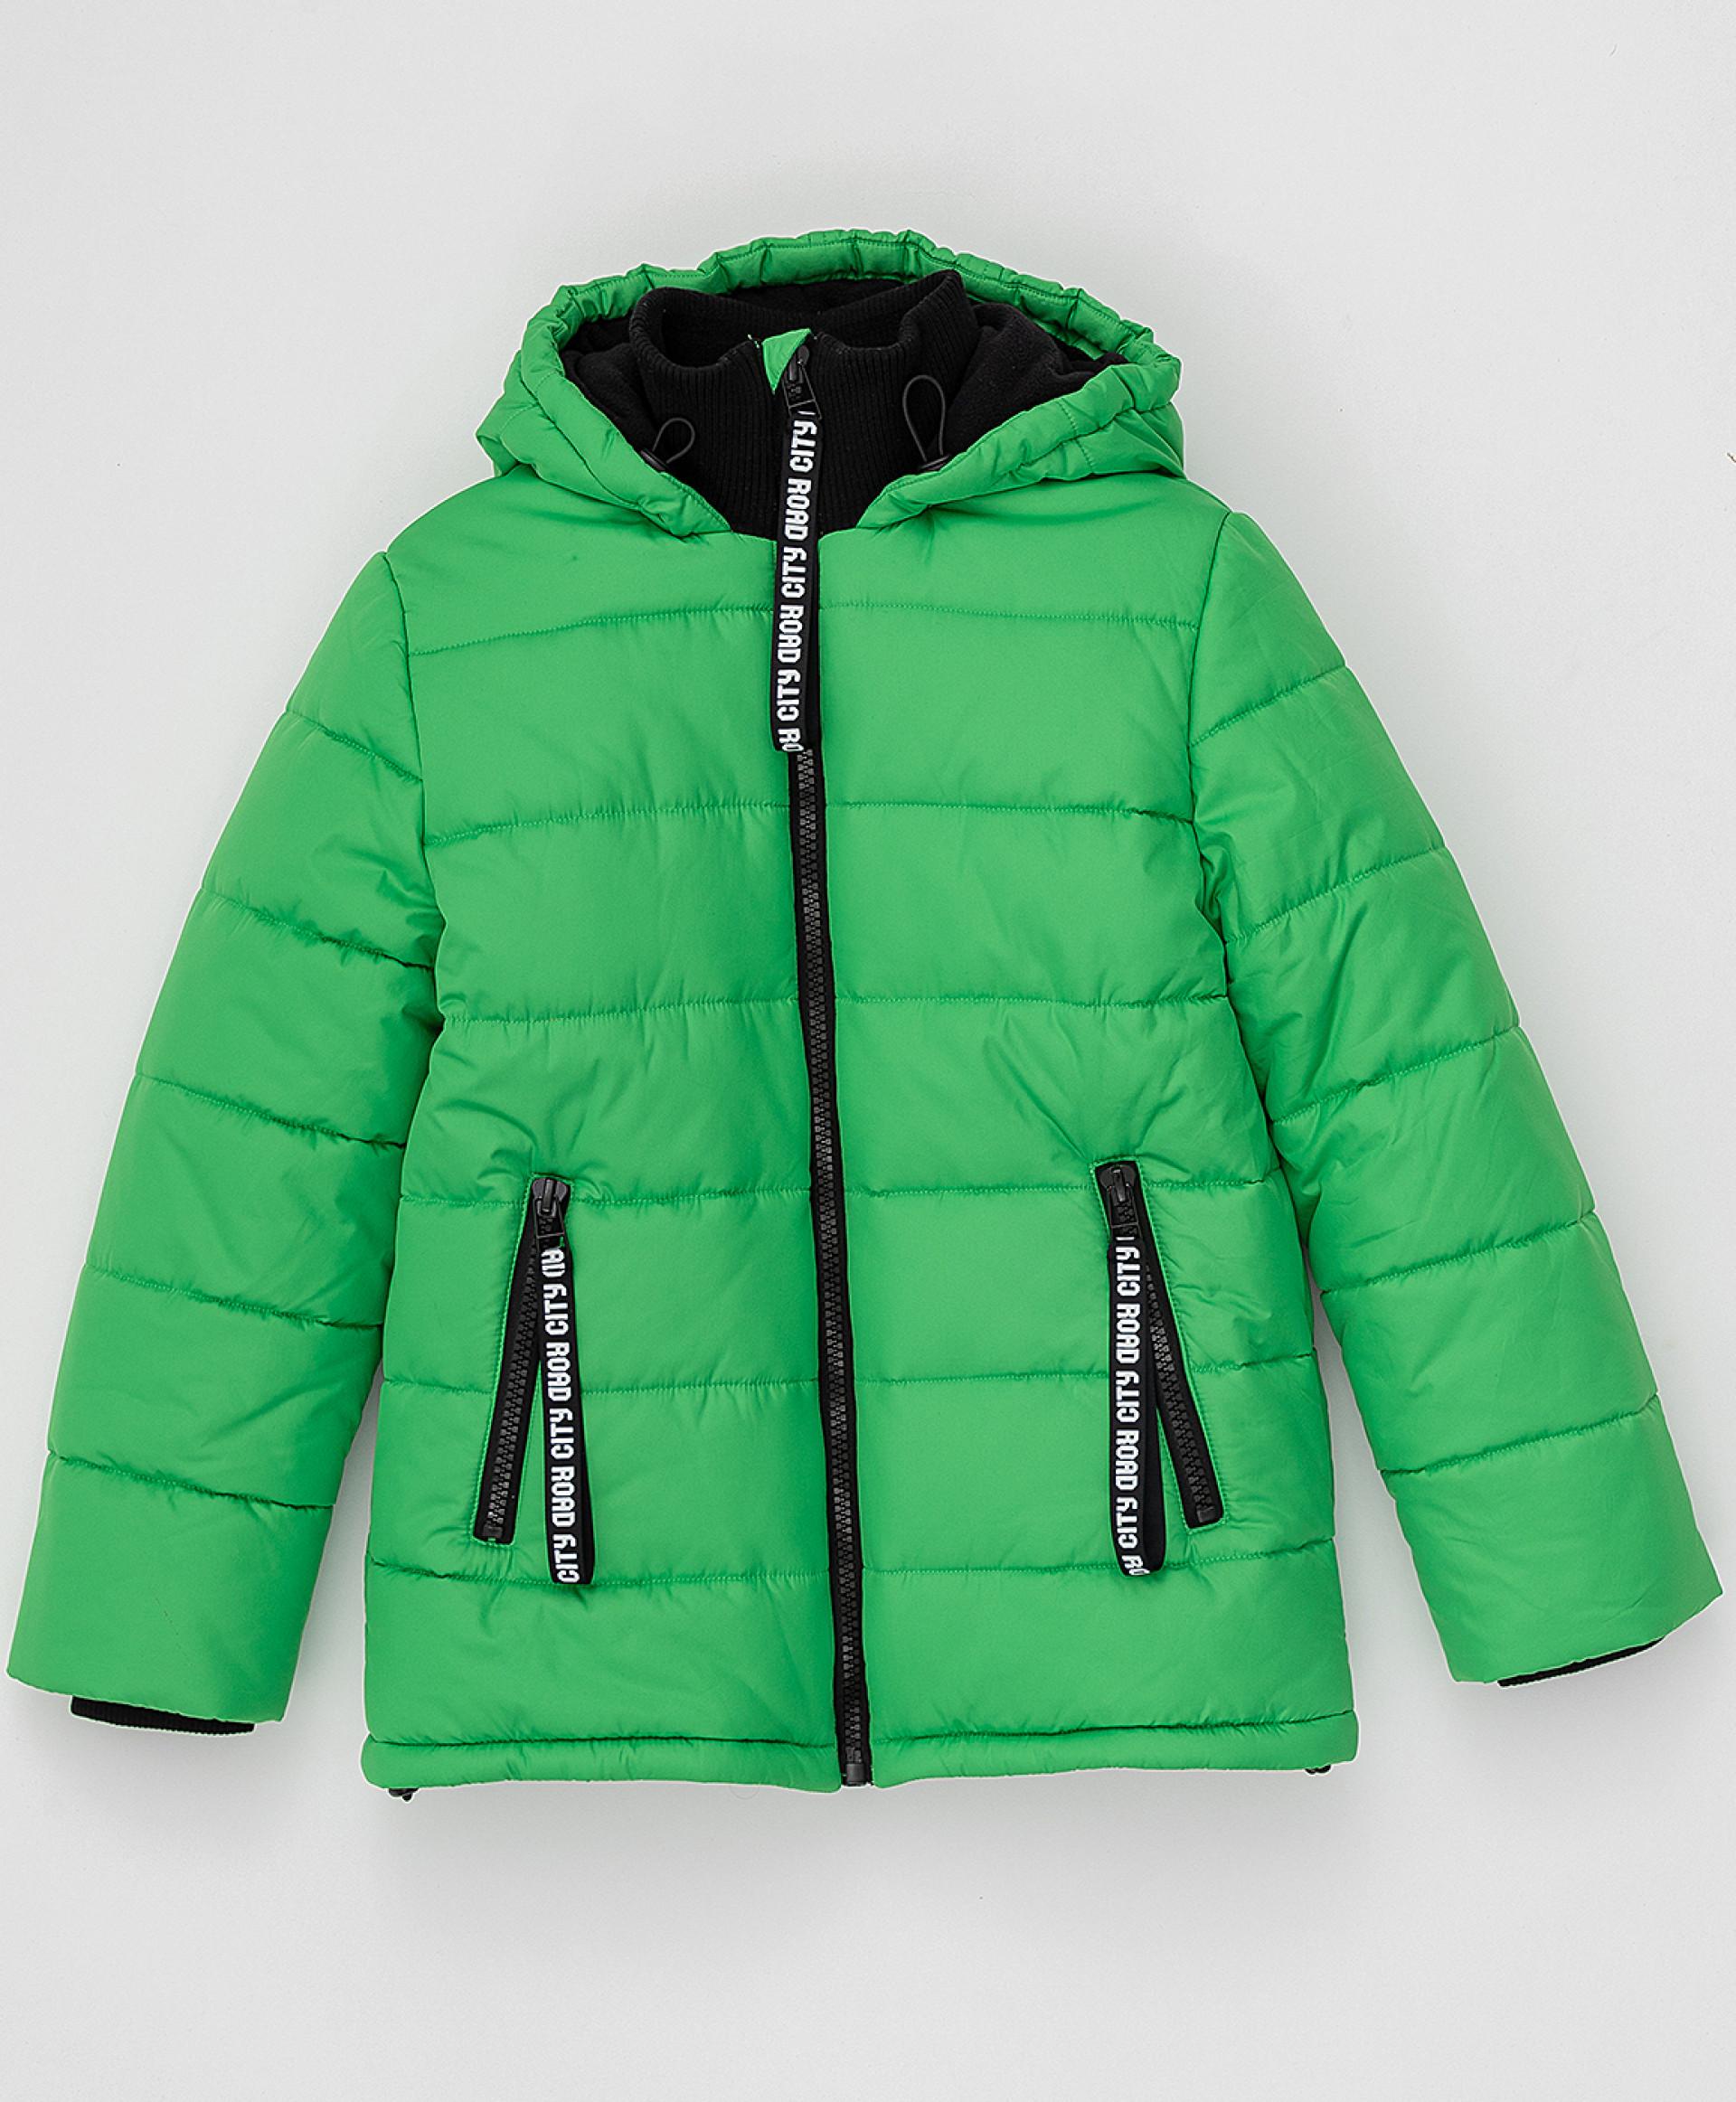 Купить Зеленая зимняя куртка Button Blue220BBBJC41024800, размер 146,